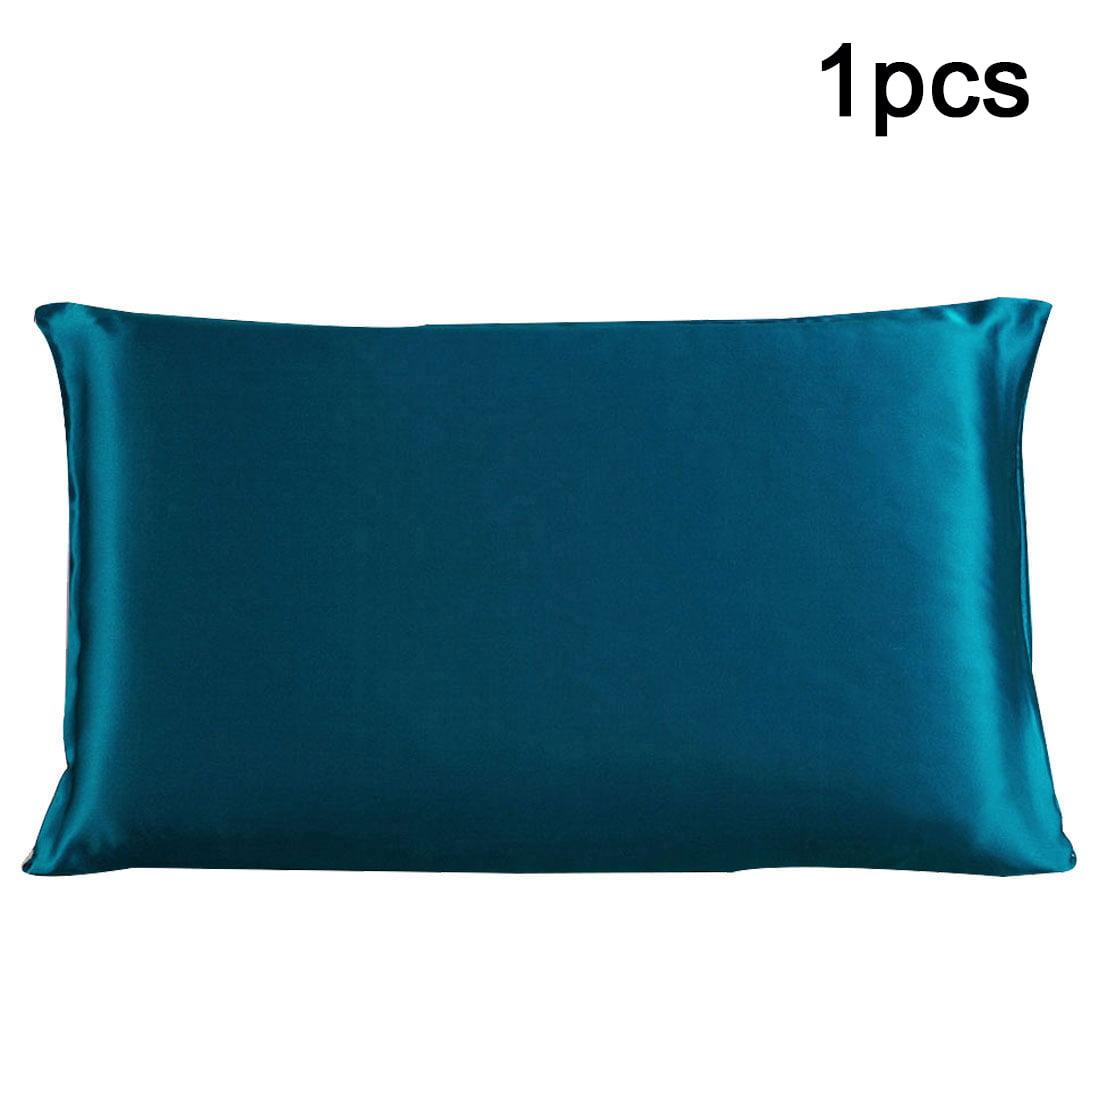 Piccocasa 100 Mulberry Silk Fabric Pillow Case Cover